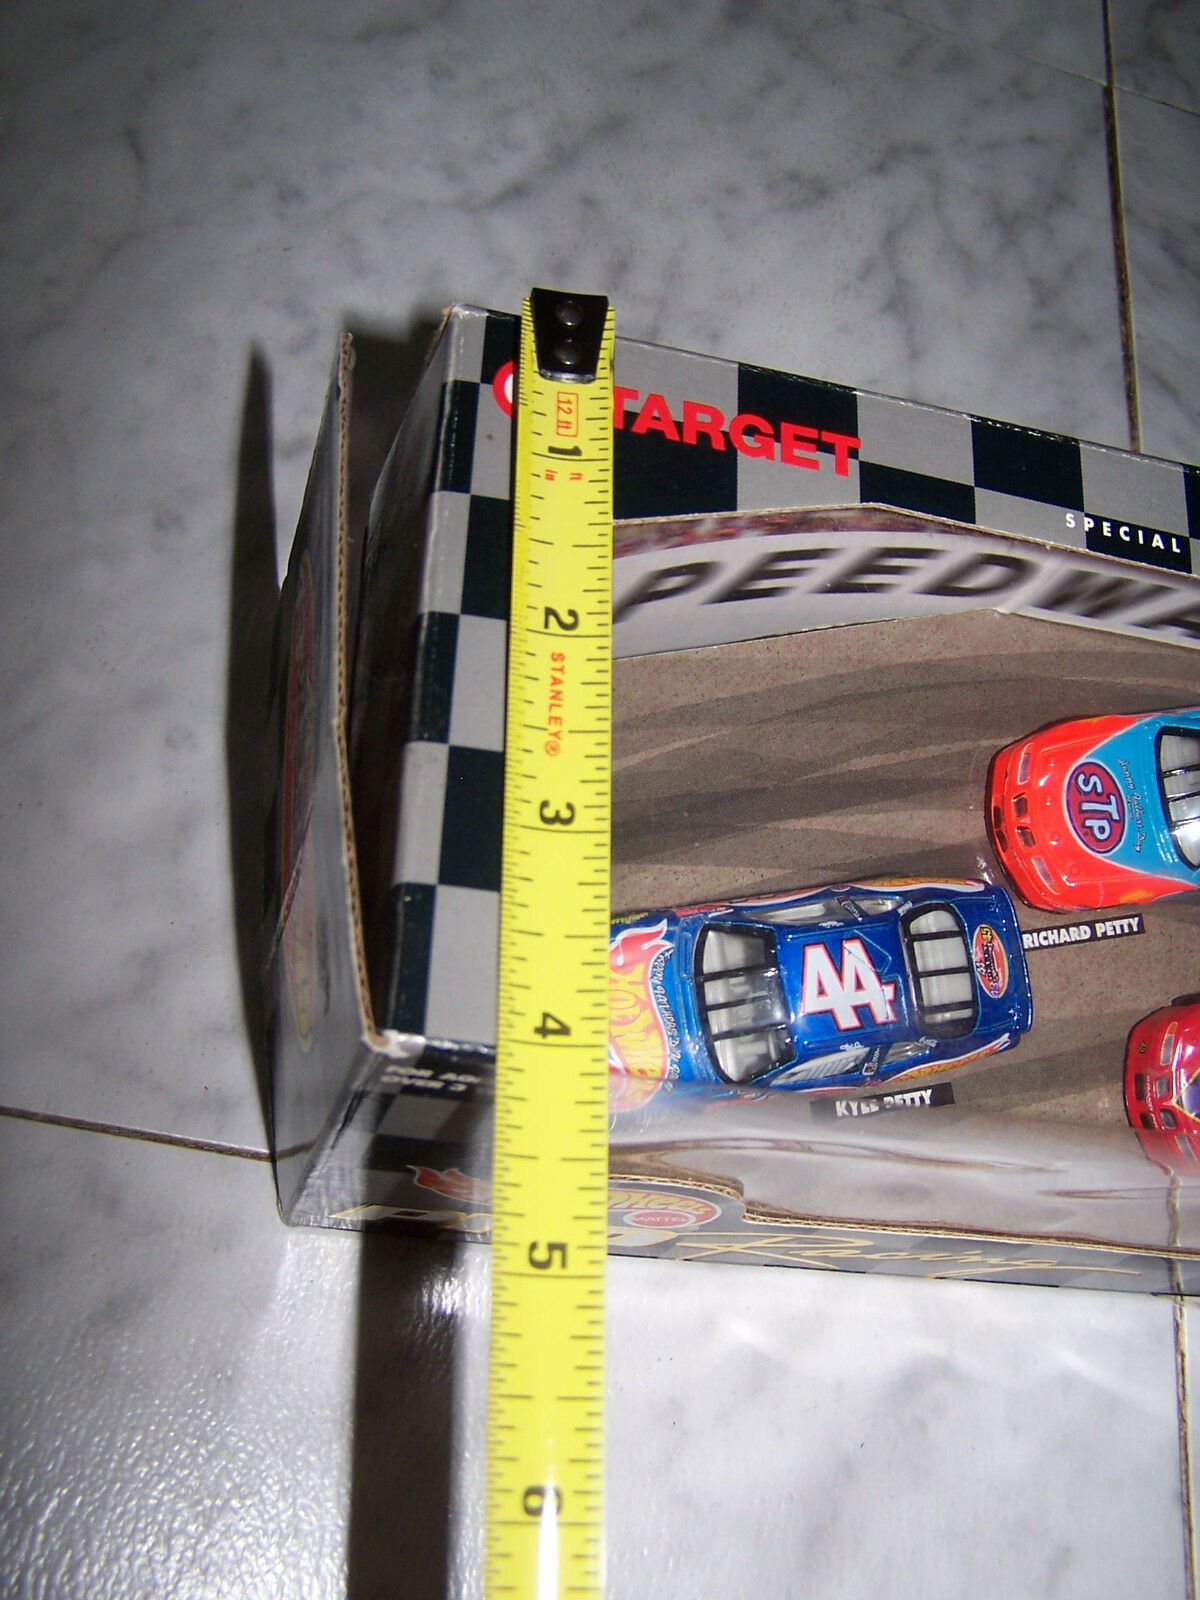 Hot Wheels By Mattel NASCAR PRO RACING 43,44,45 Petty Petty Petty Generation (1998) Special 346174